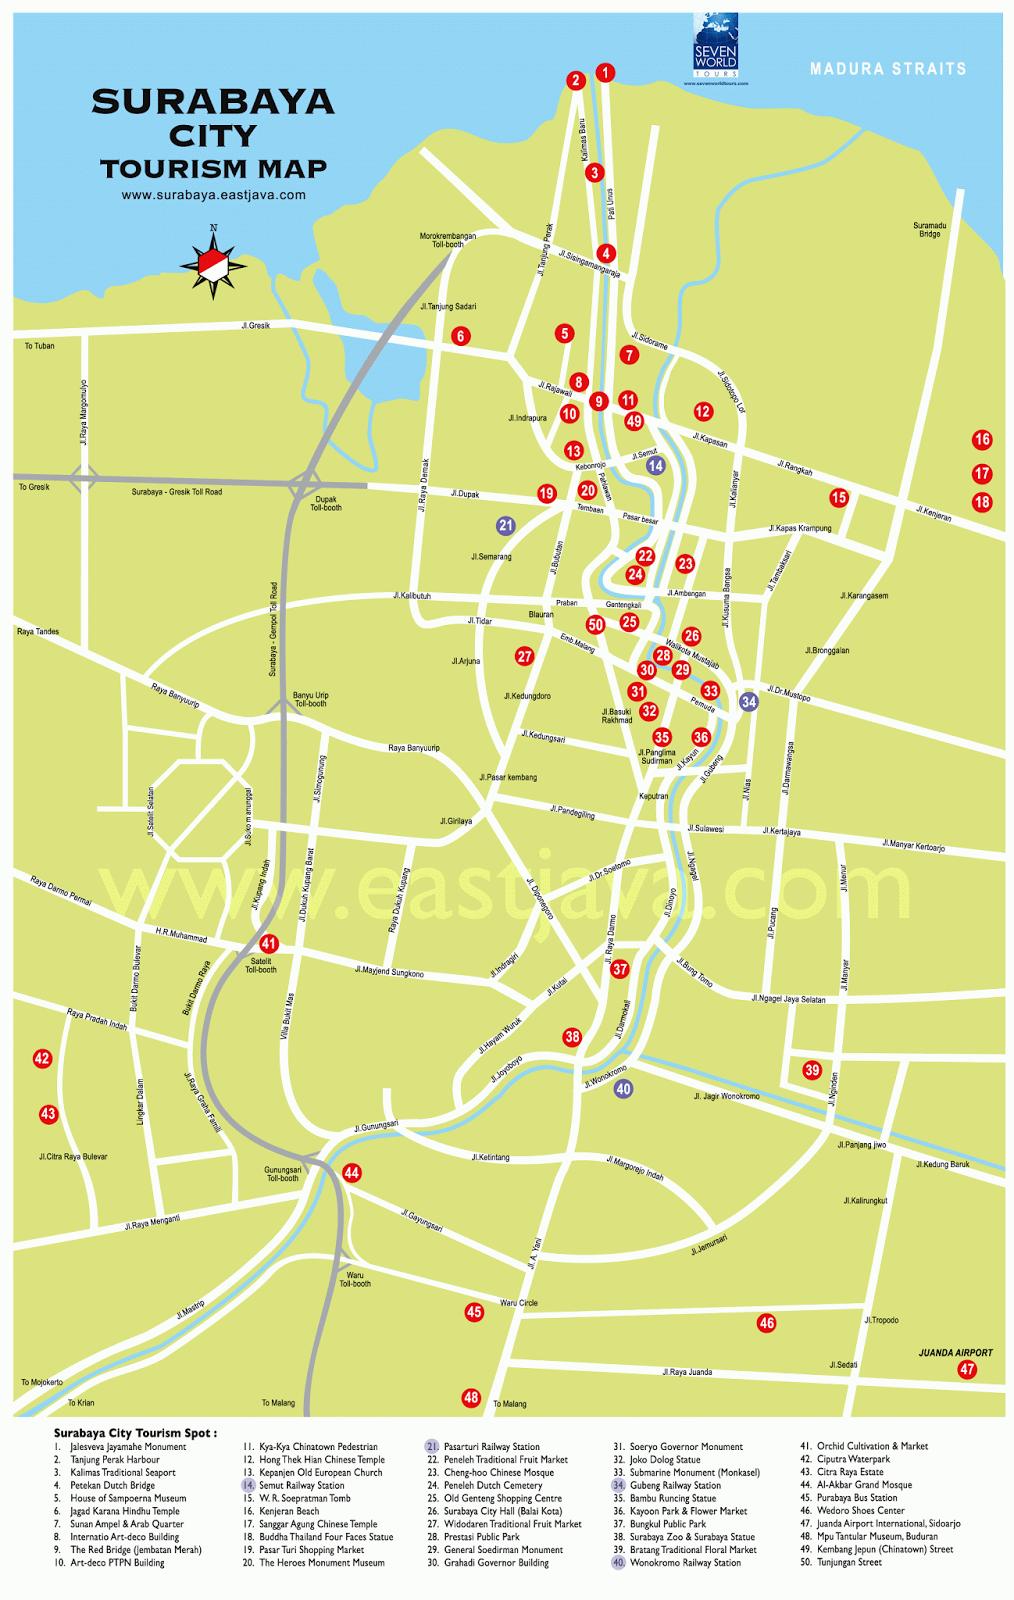 Peta Digital lokasi Wisata Surabaya